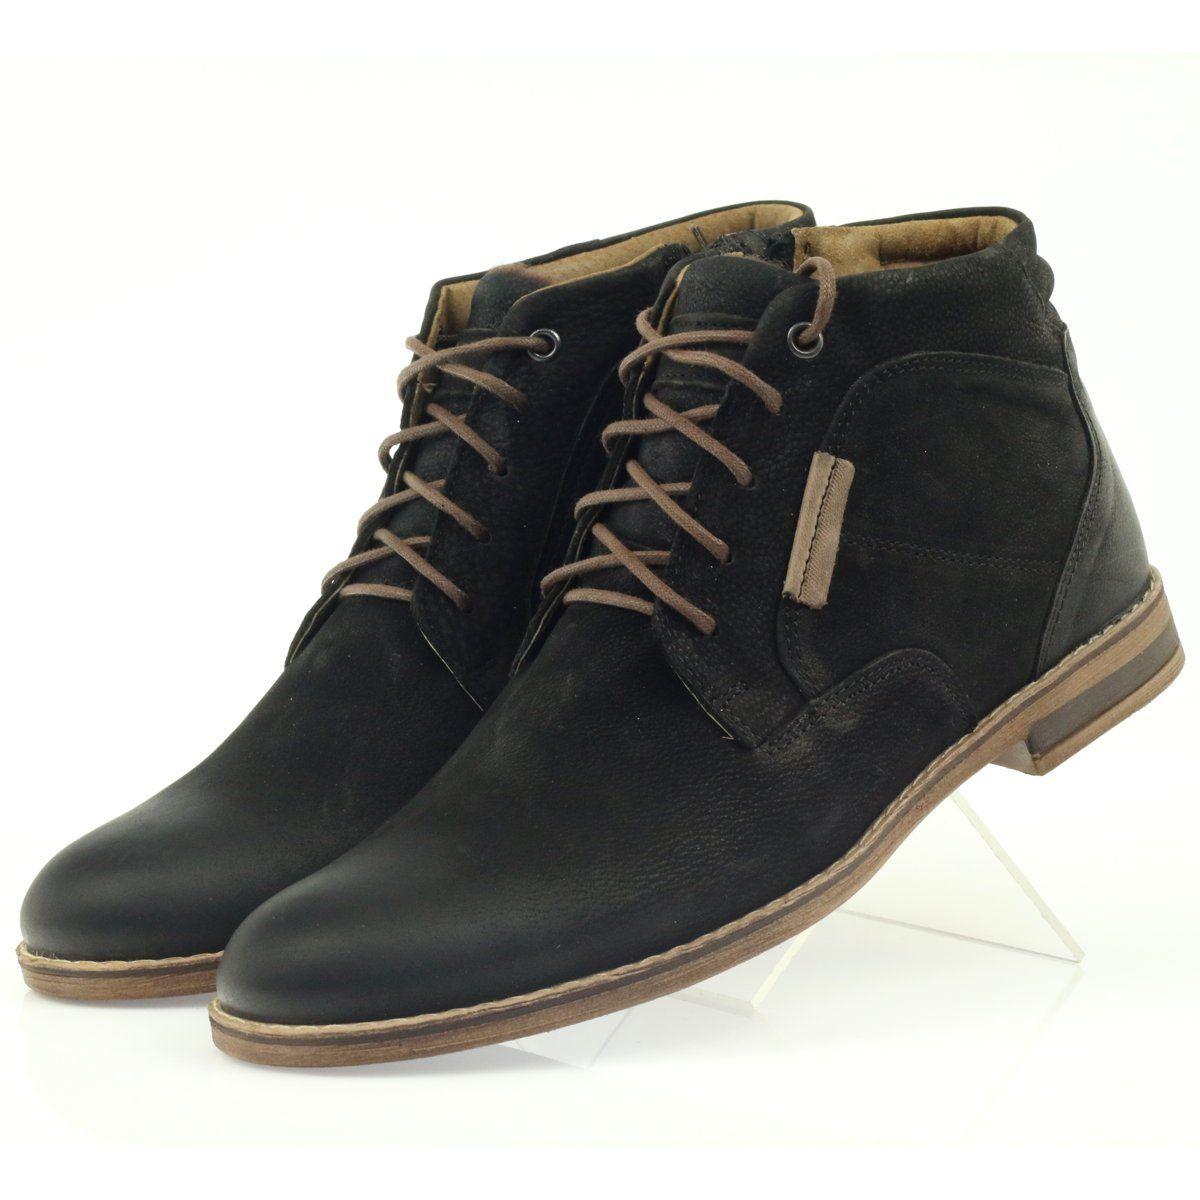 Sztyblety Meskie Riko Botki Sztyblety Na Suwak Riko Czarne Chukka Boots Shoes Boots